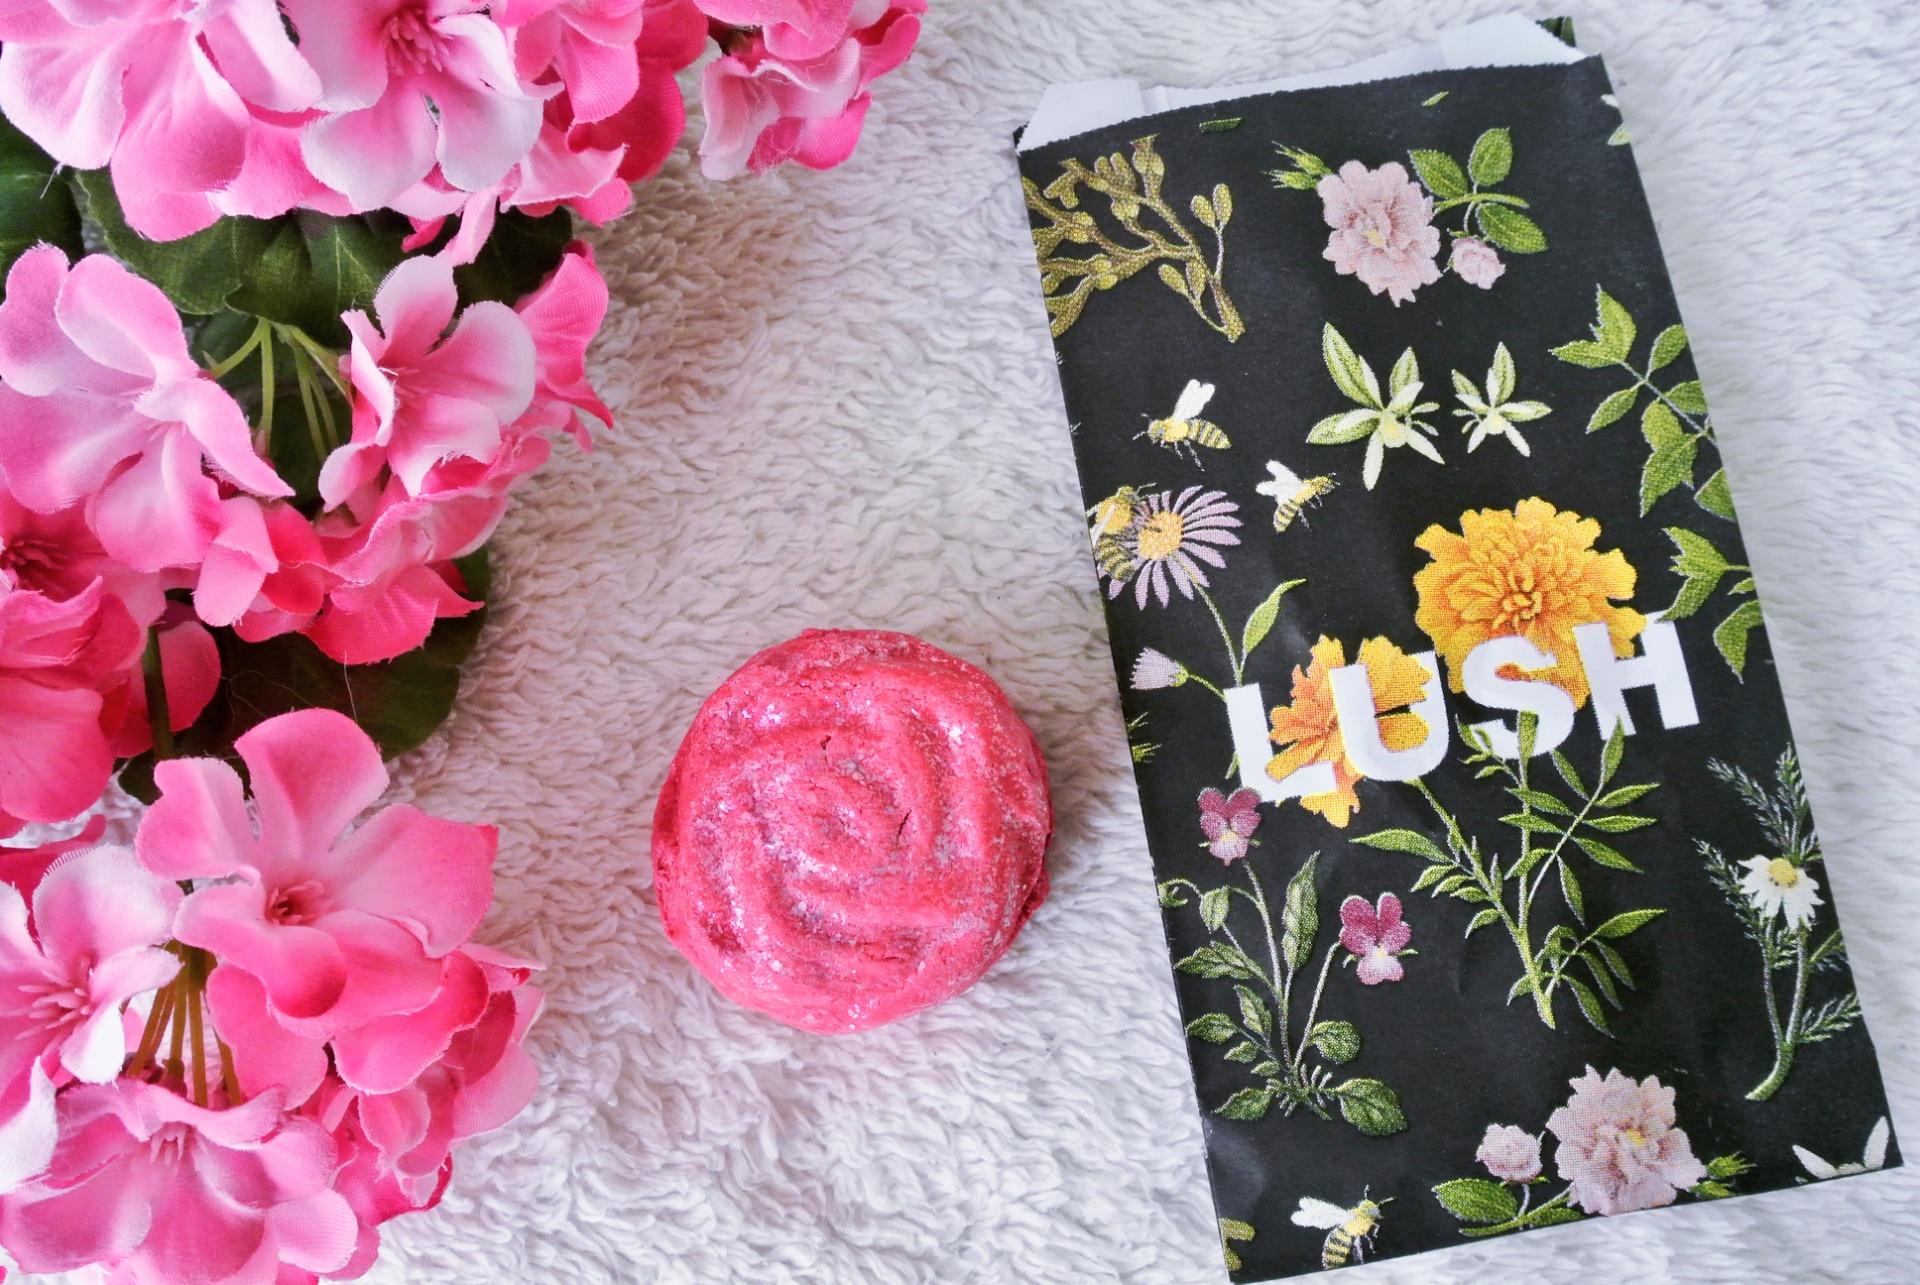 Lush Cosmetics Spring Mini-Haul // Rose Jam Bubbleroon